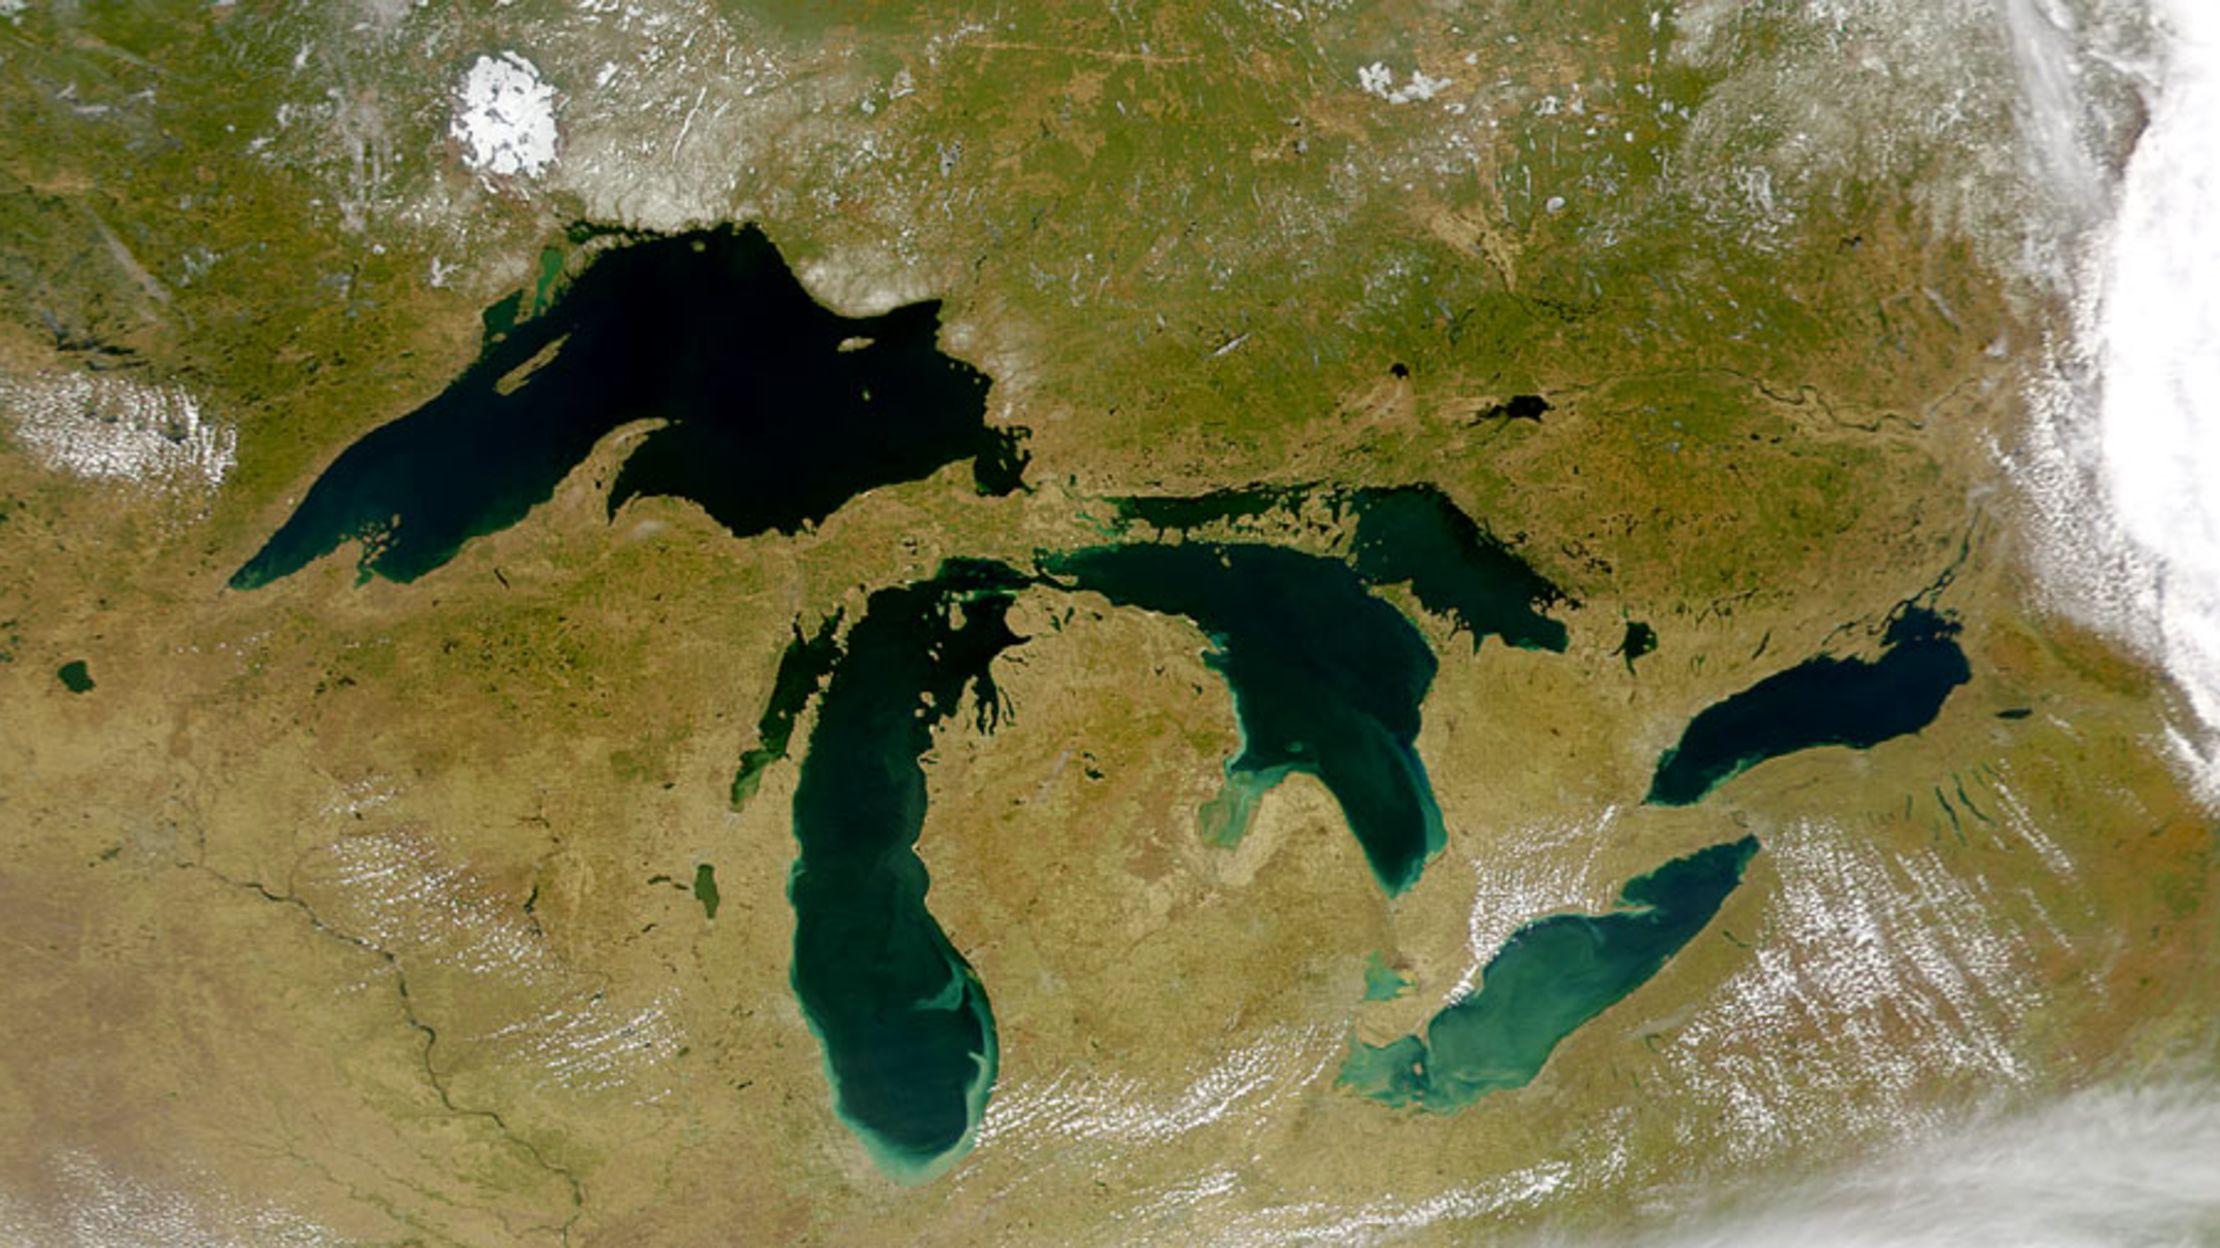 6 pcs Lake Erie Special No.1 size 6 size 6